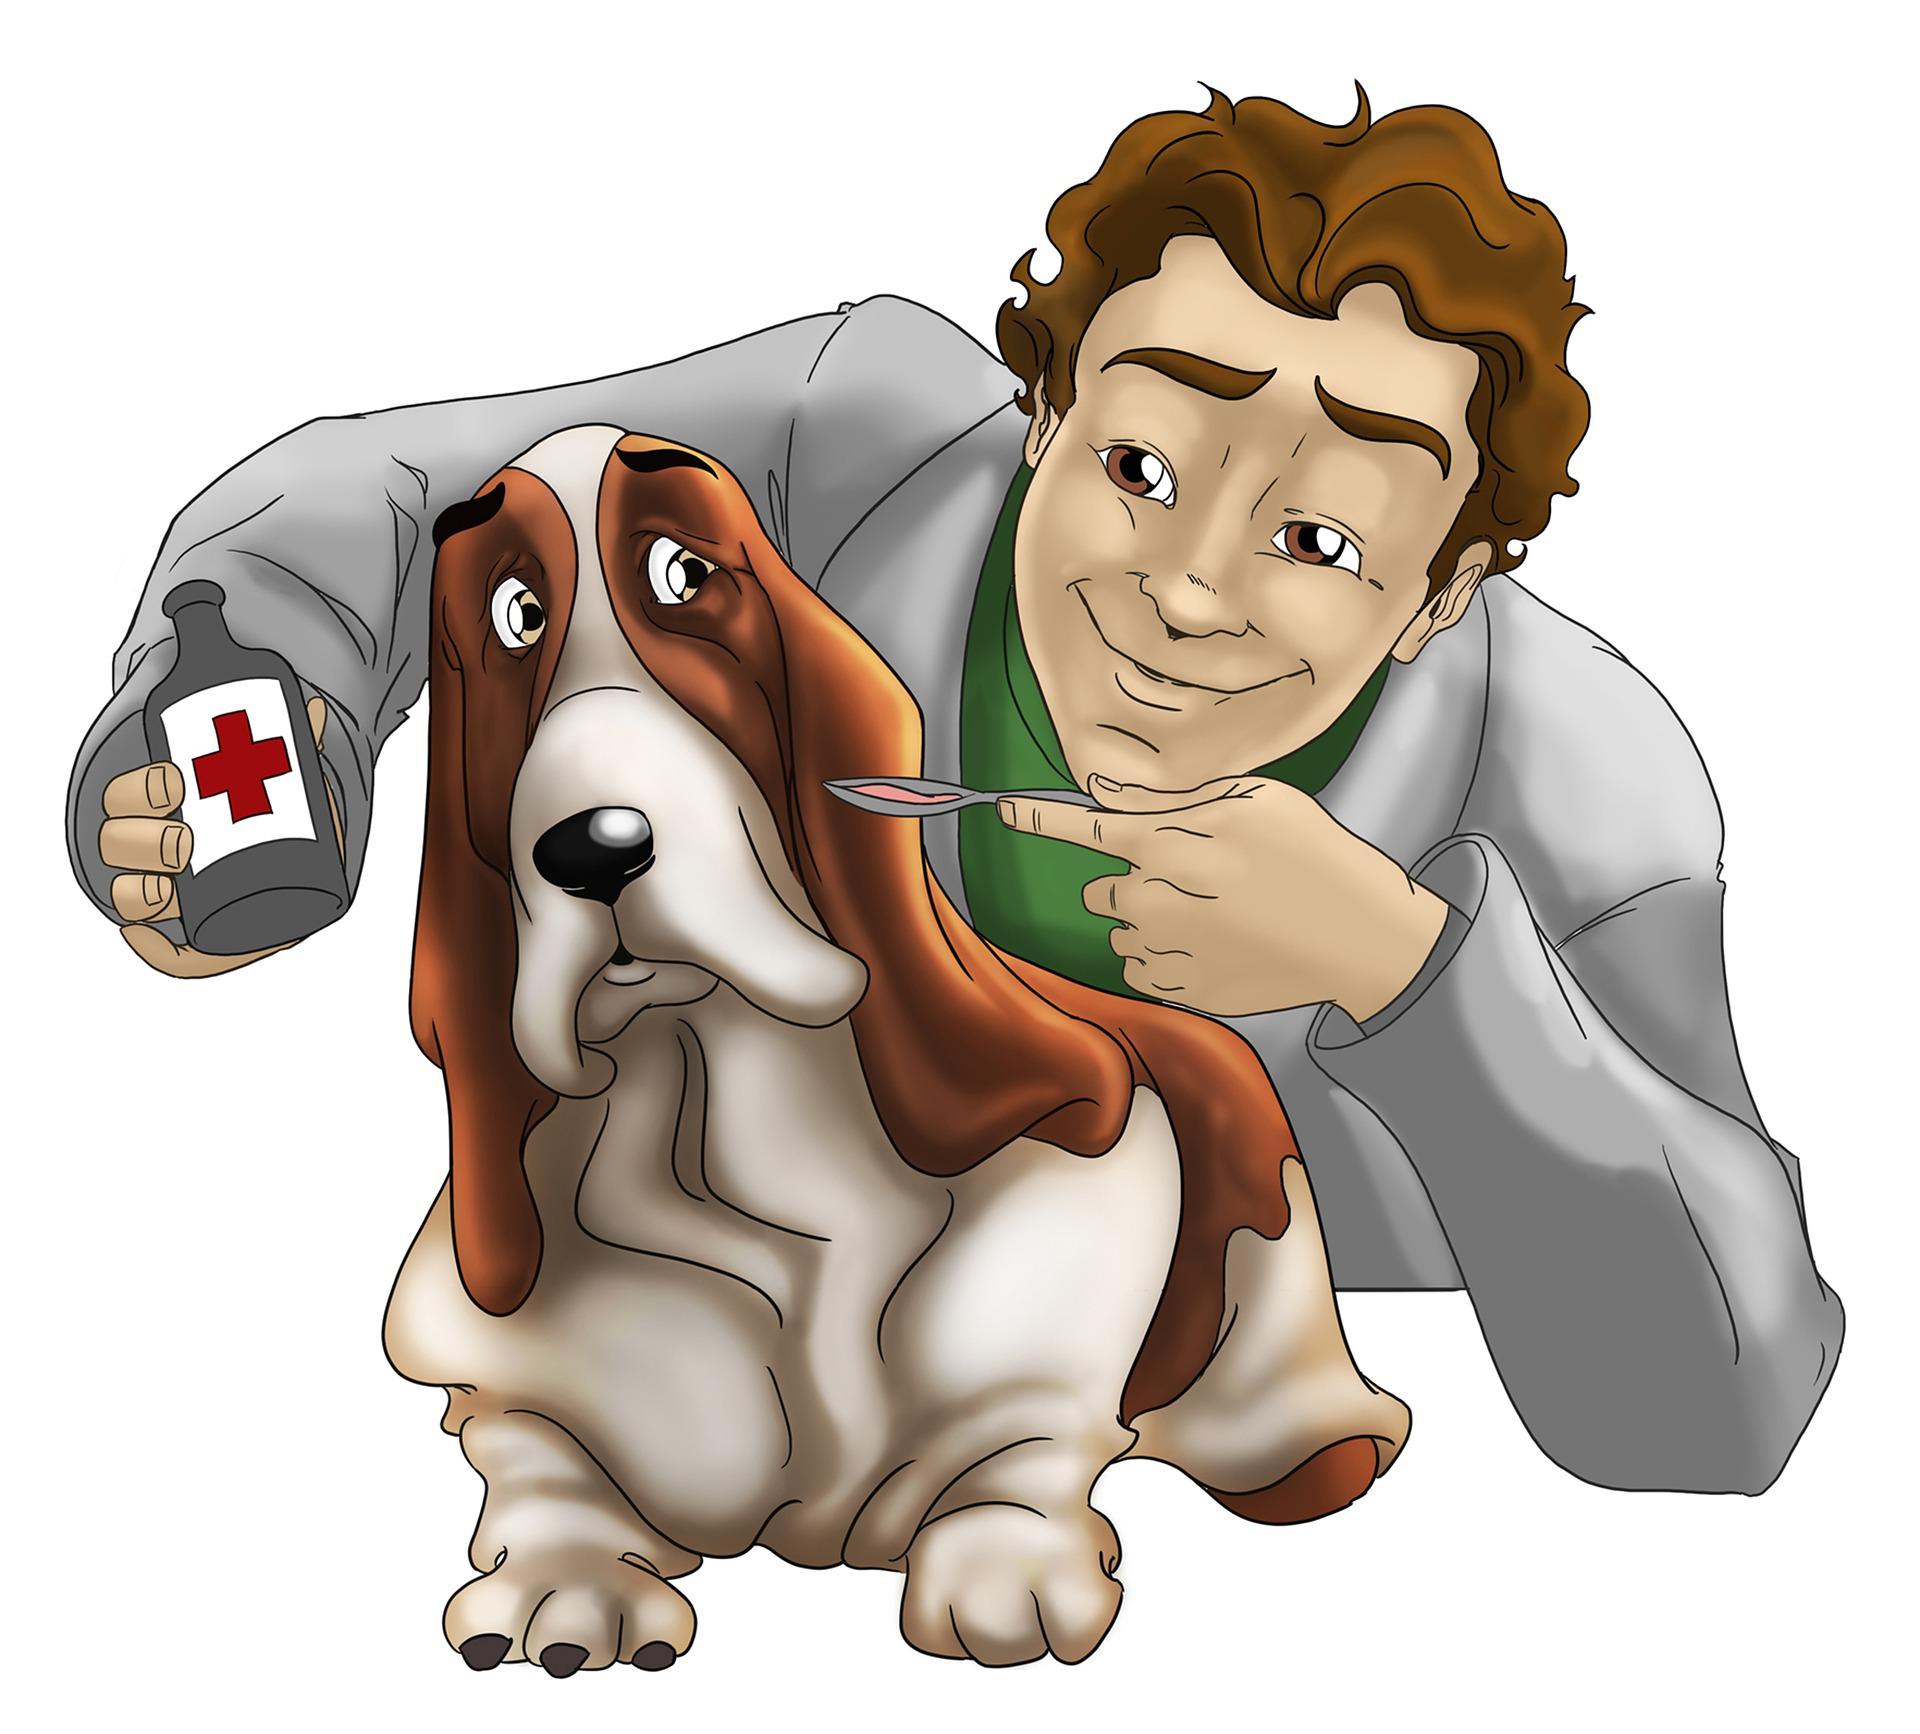 Dog at vet clipart clip art royalty free 28+ Collection of Free Vet Clipart | High quality, free cliparts ... clip art royalty free